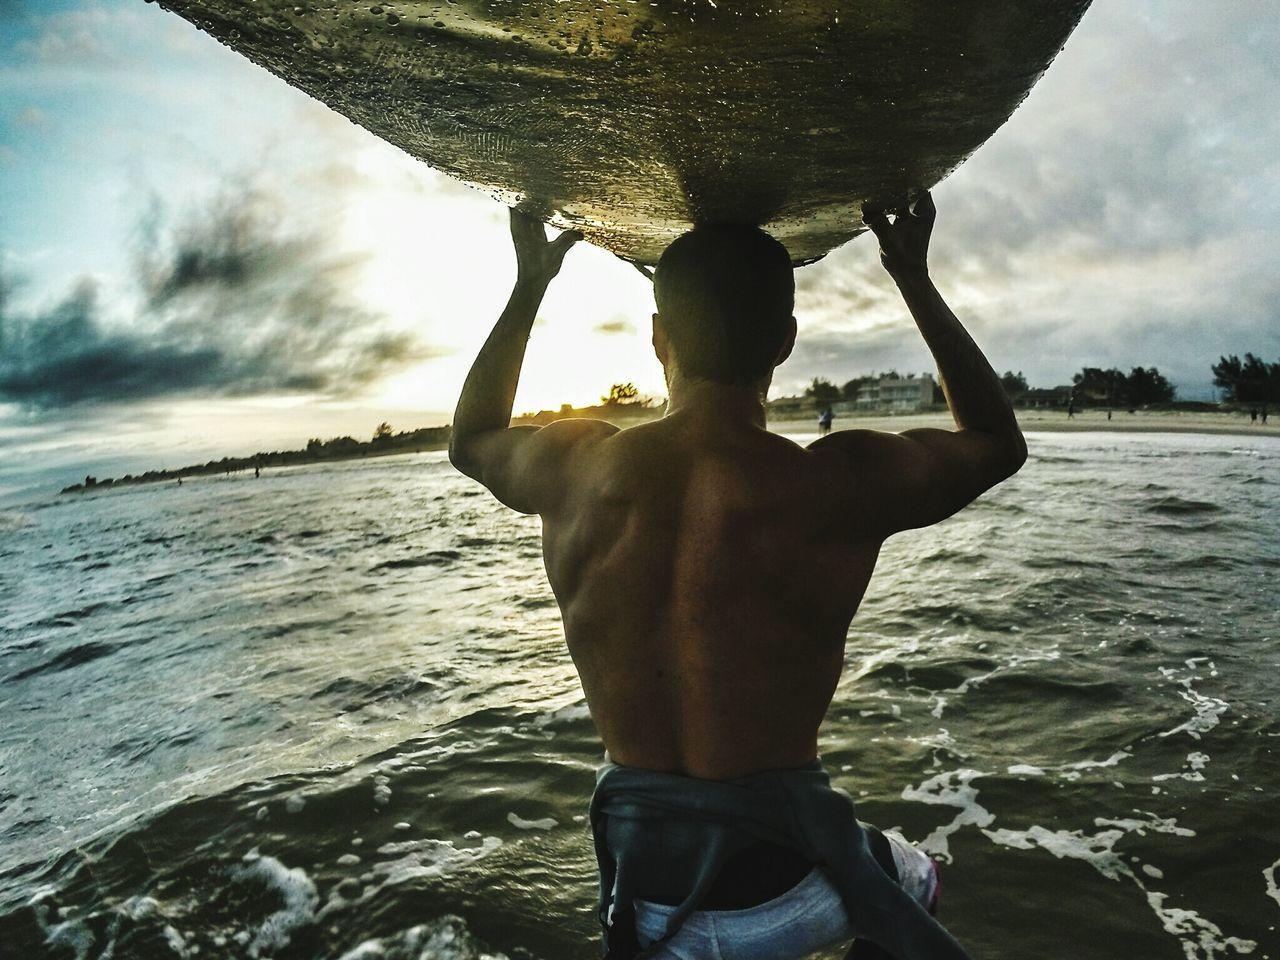 Rear view of man carrying surfboard walking towards sea